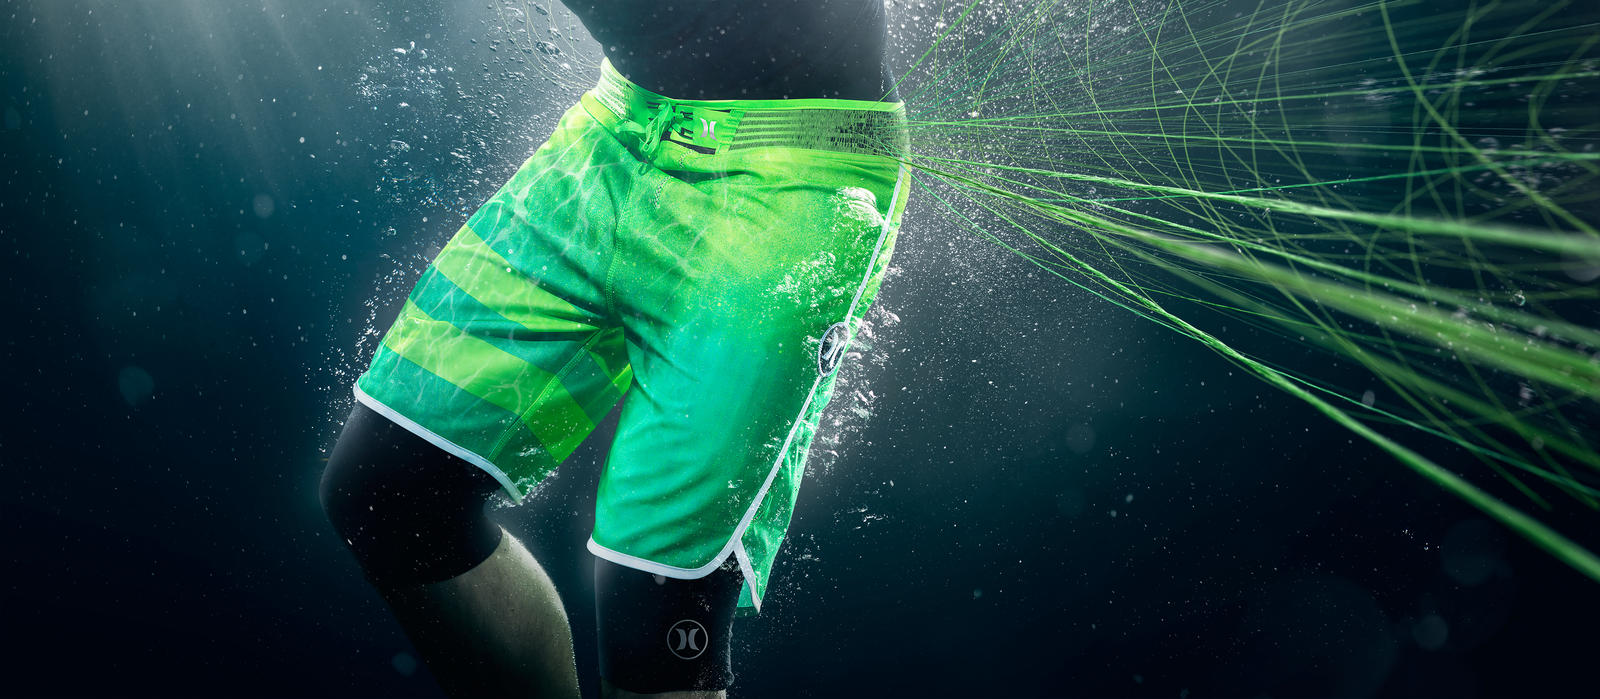 Hurley_Hyperweave_Shorts_Final_native_1600